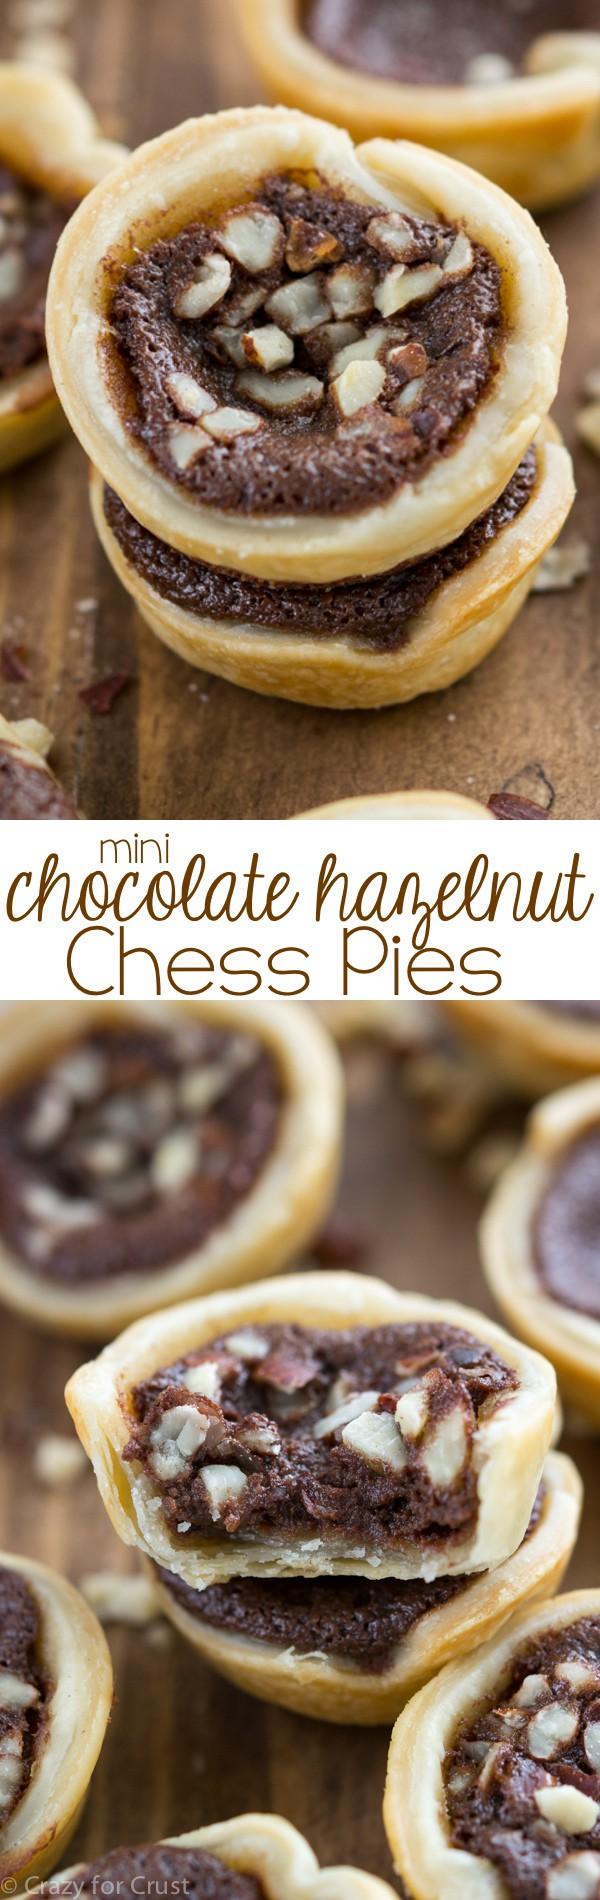 Mini Chocolate Hazelnut Chess Pies